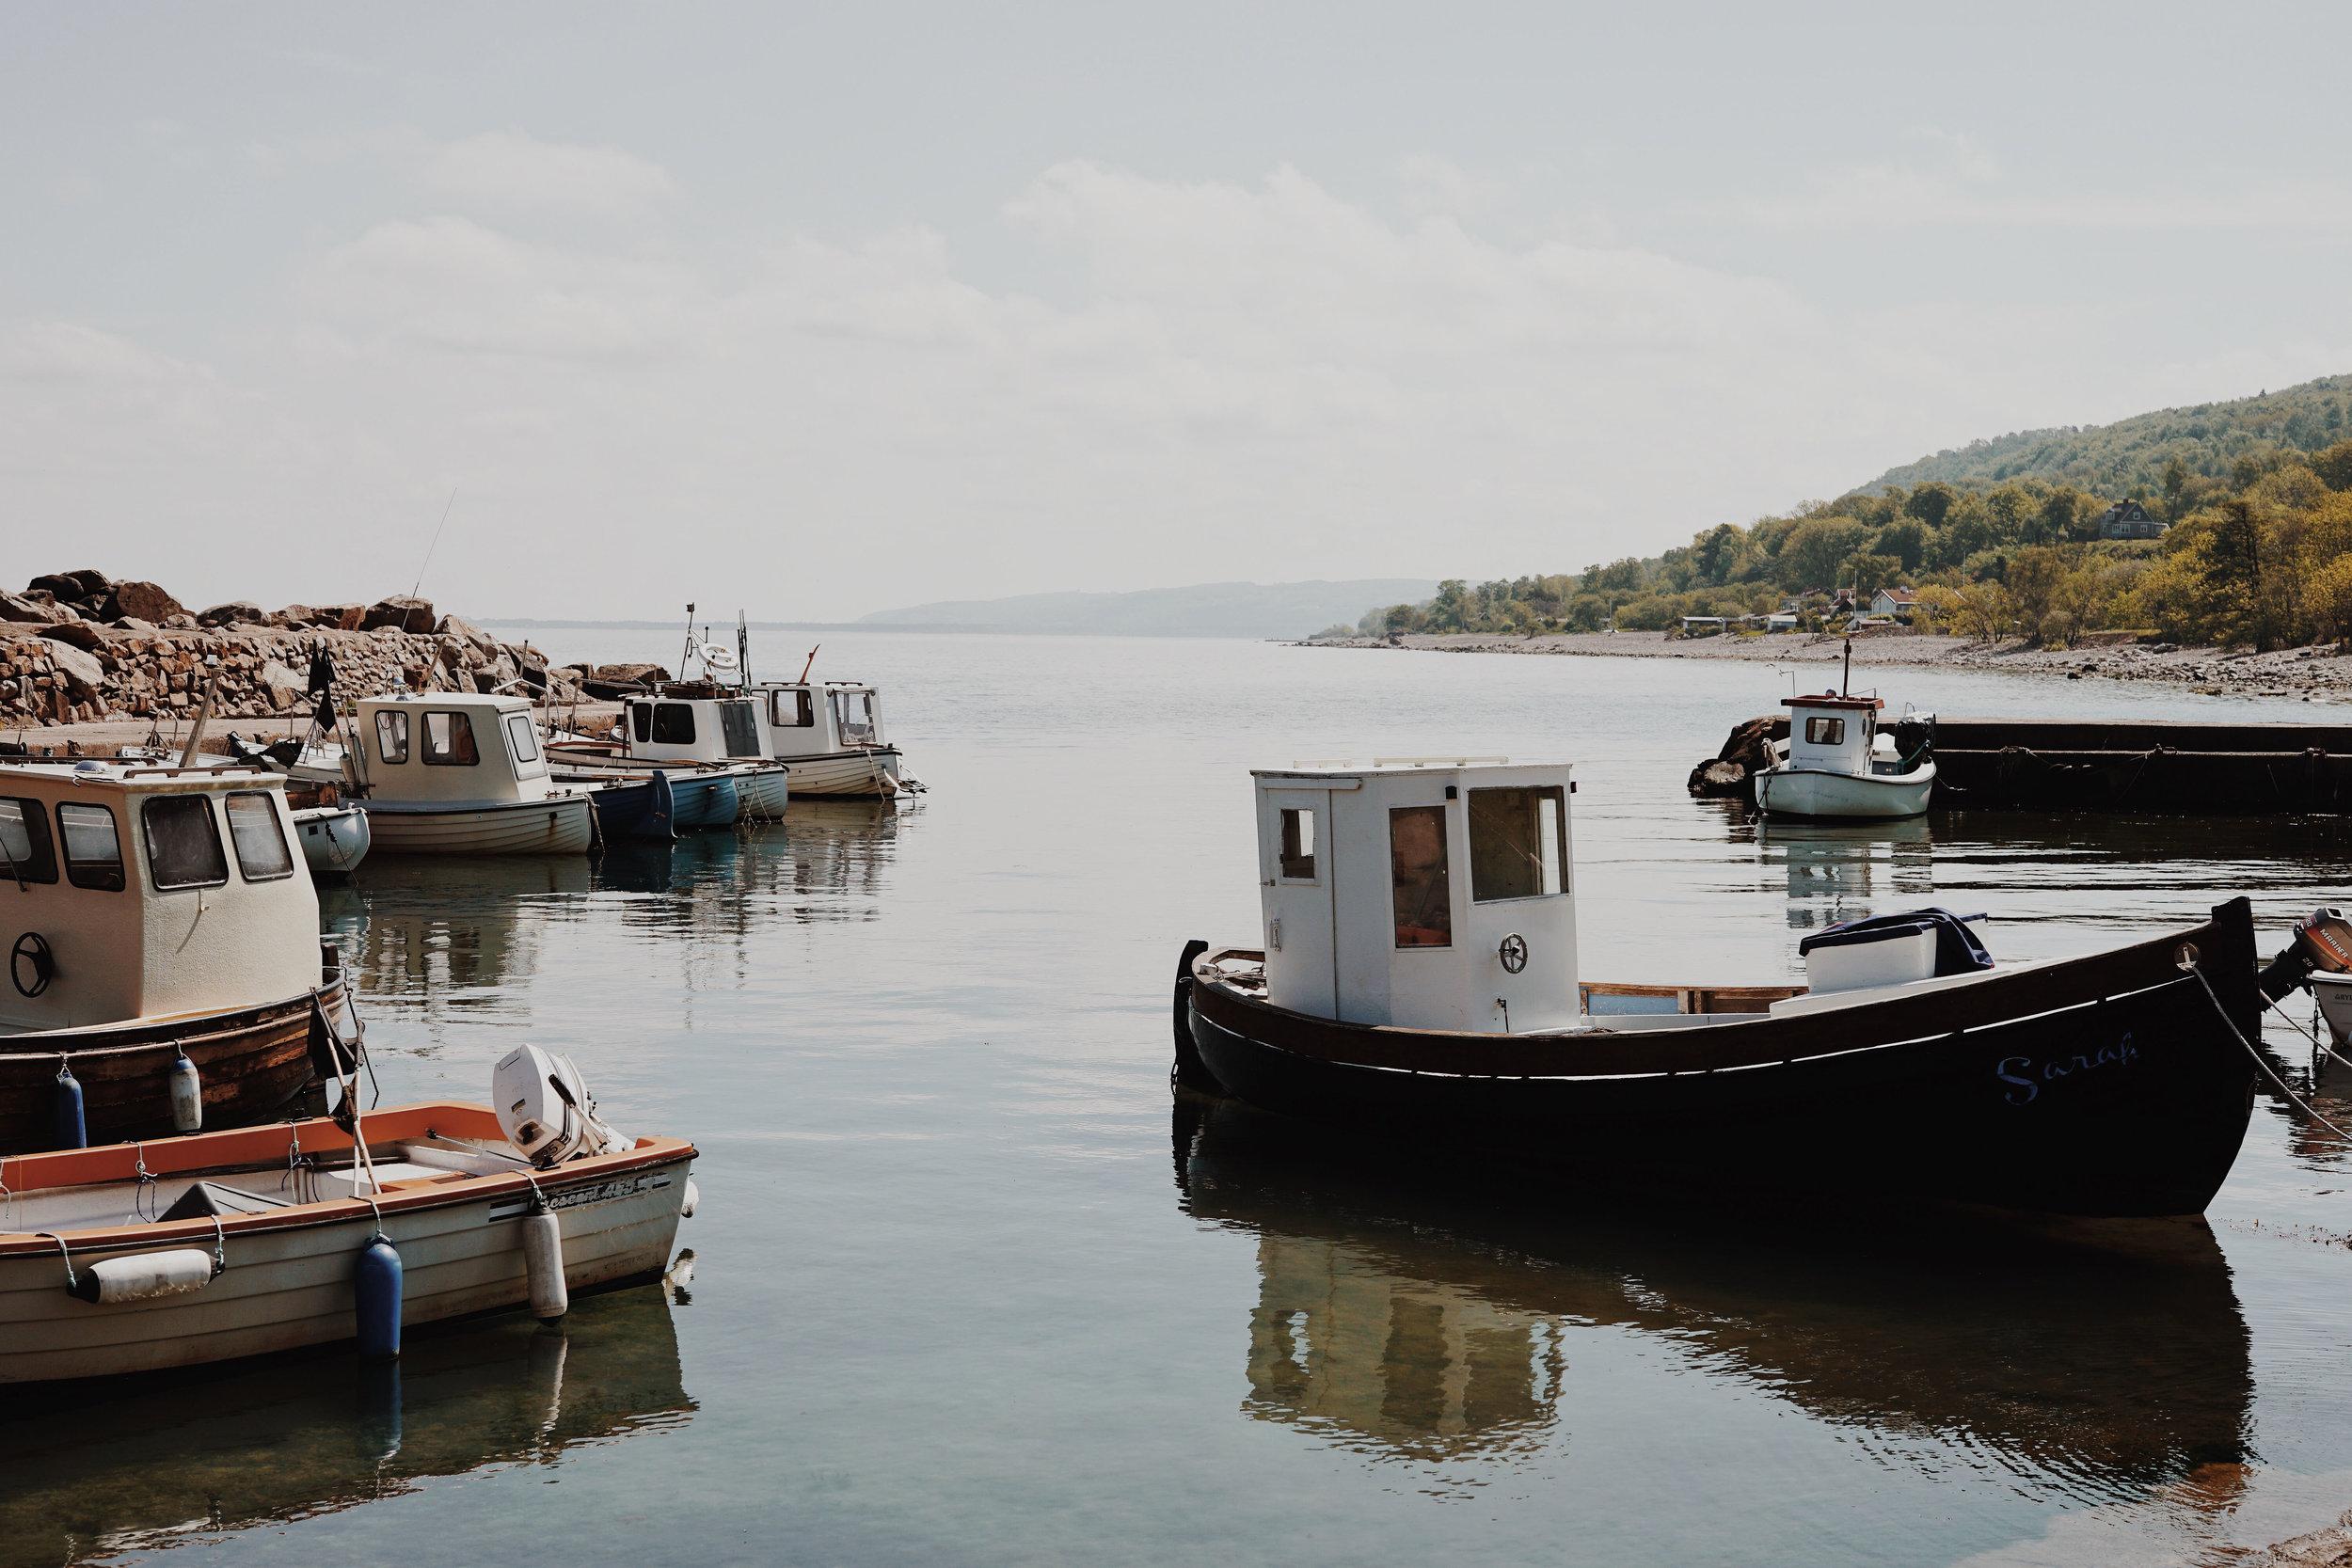 ASROSENVINGE_VisitSkane_Sweden_Kattvik_Harbour_Boats_LowRes-193.jpg